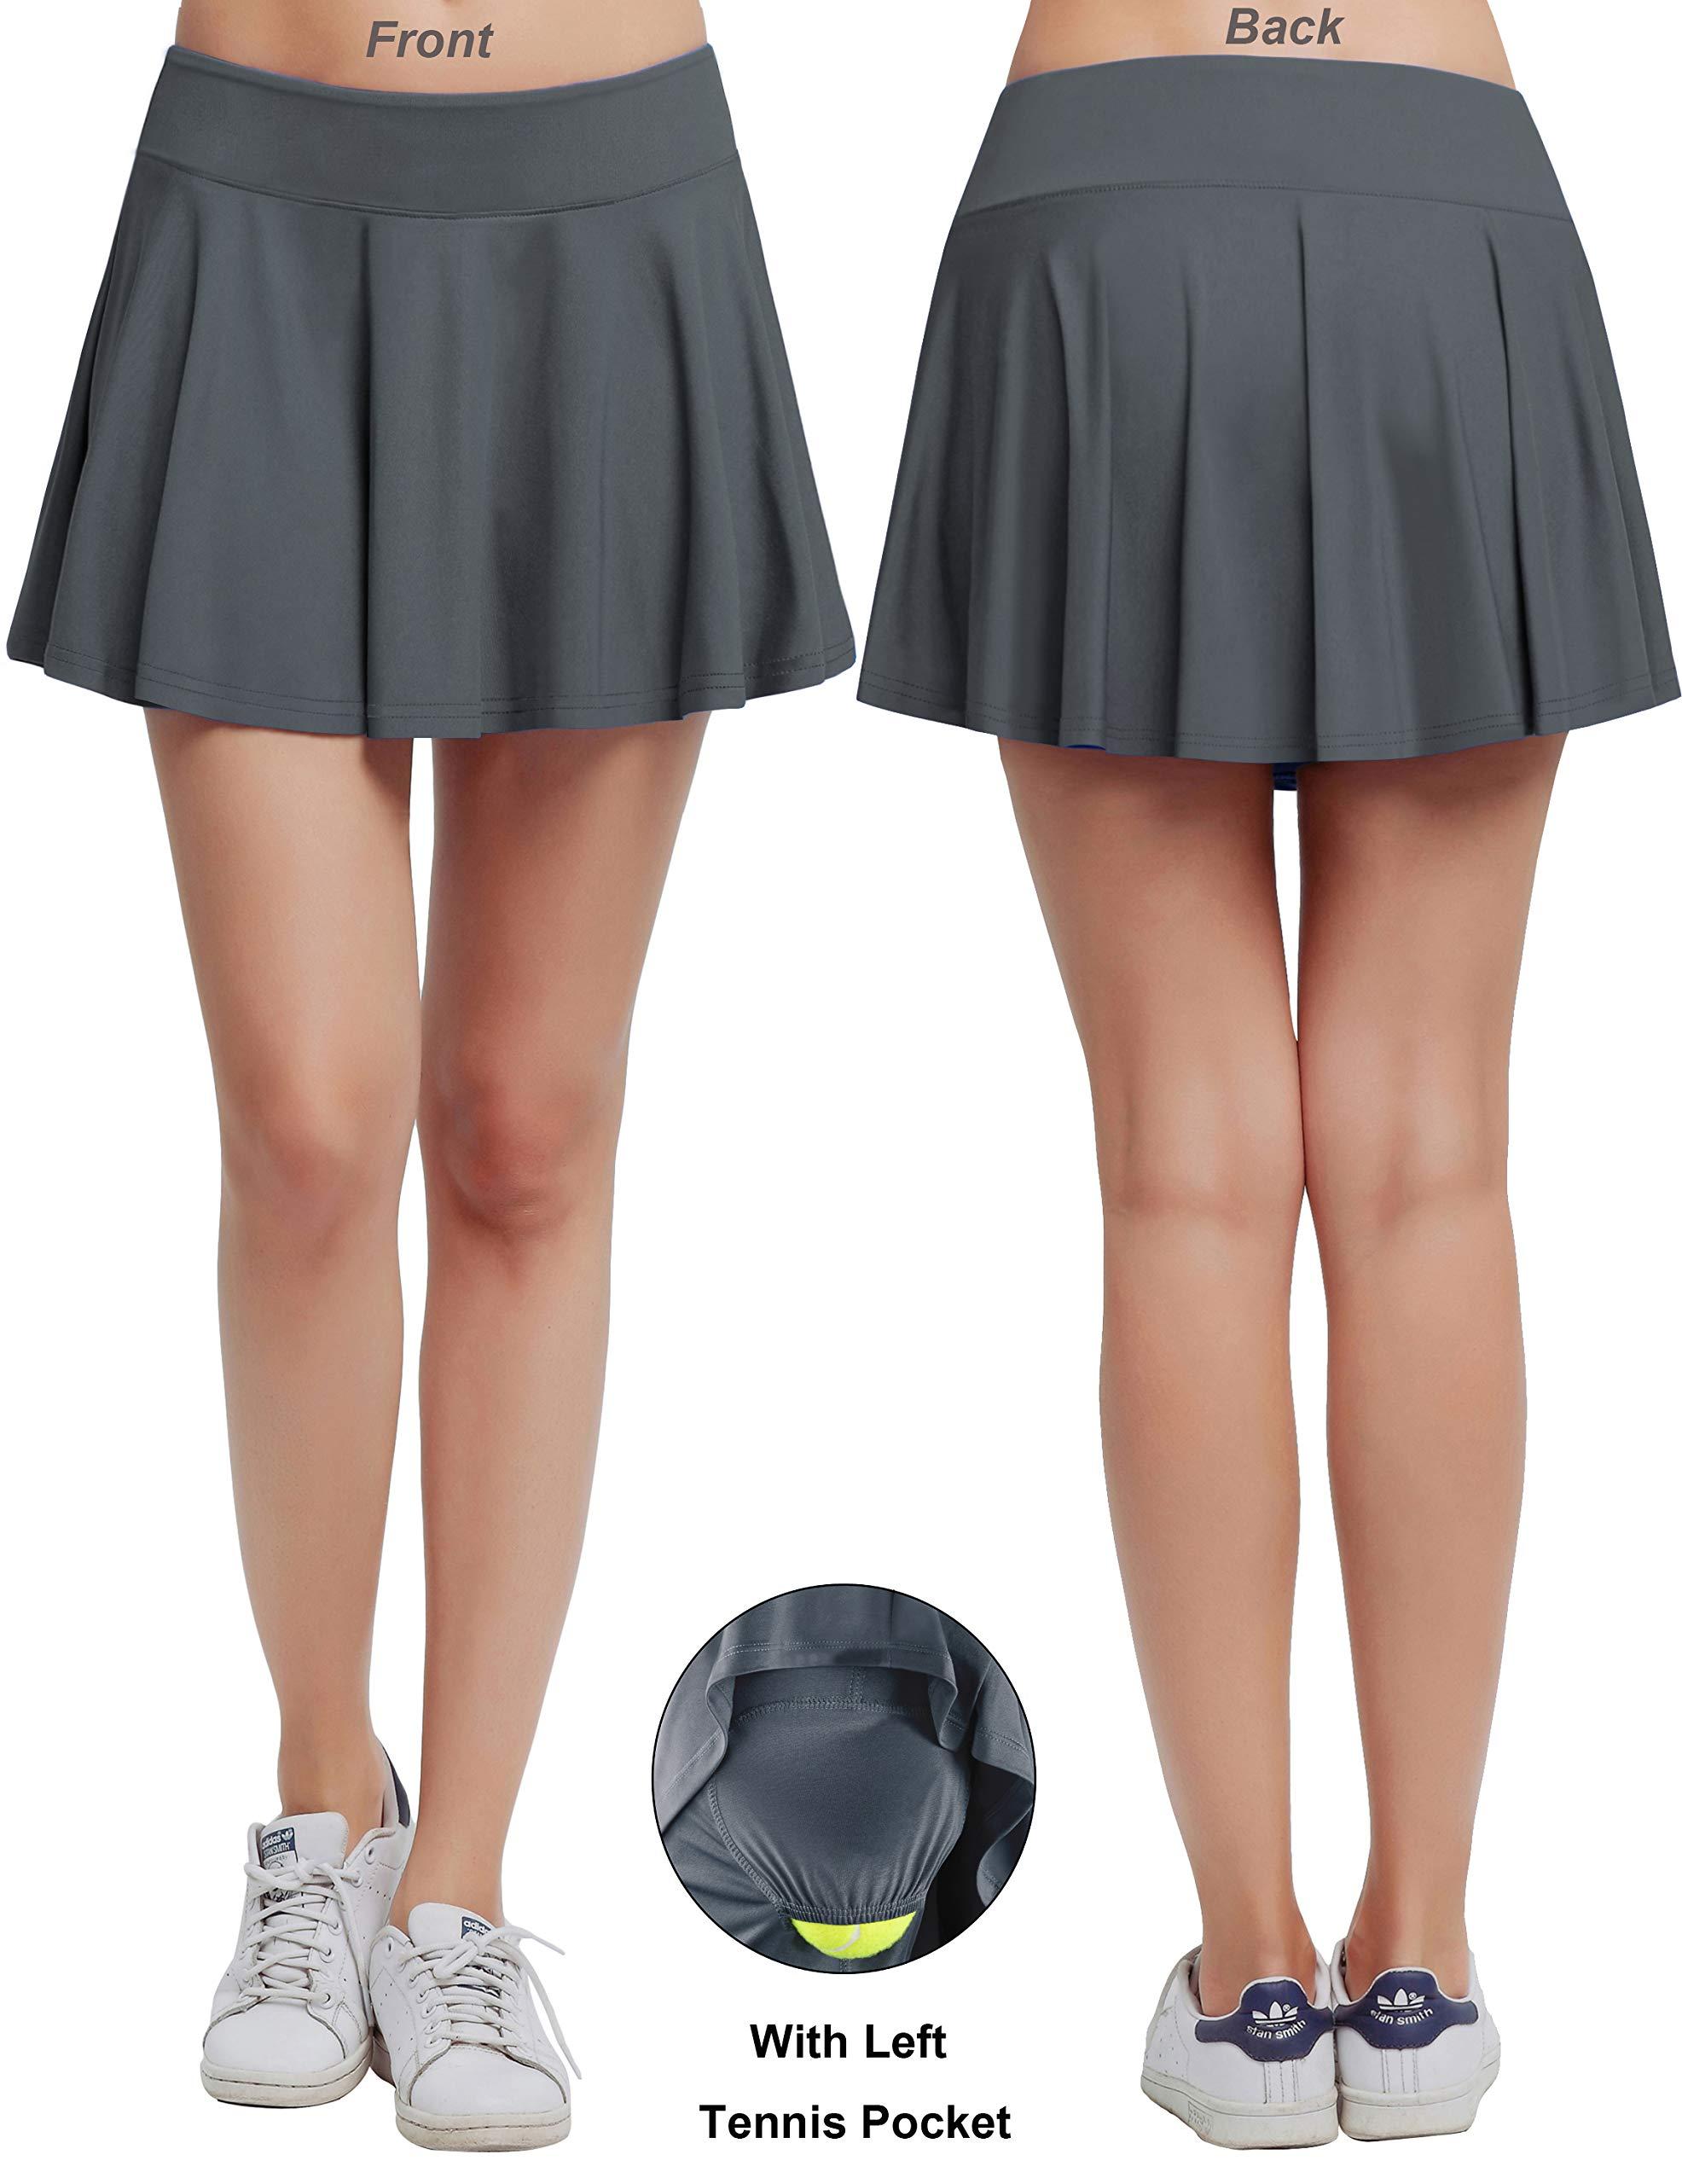 Women's Fitness Pleated Skirts Active Running Tennis Golf Lightweight Skorts With Built-In Shorts size Medium (Grey)